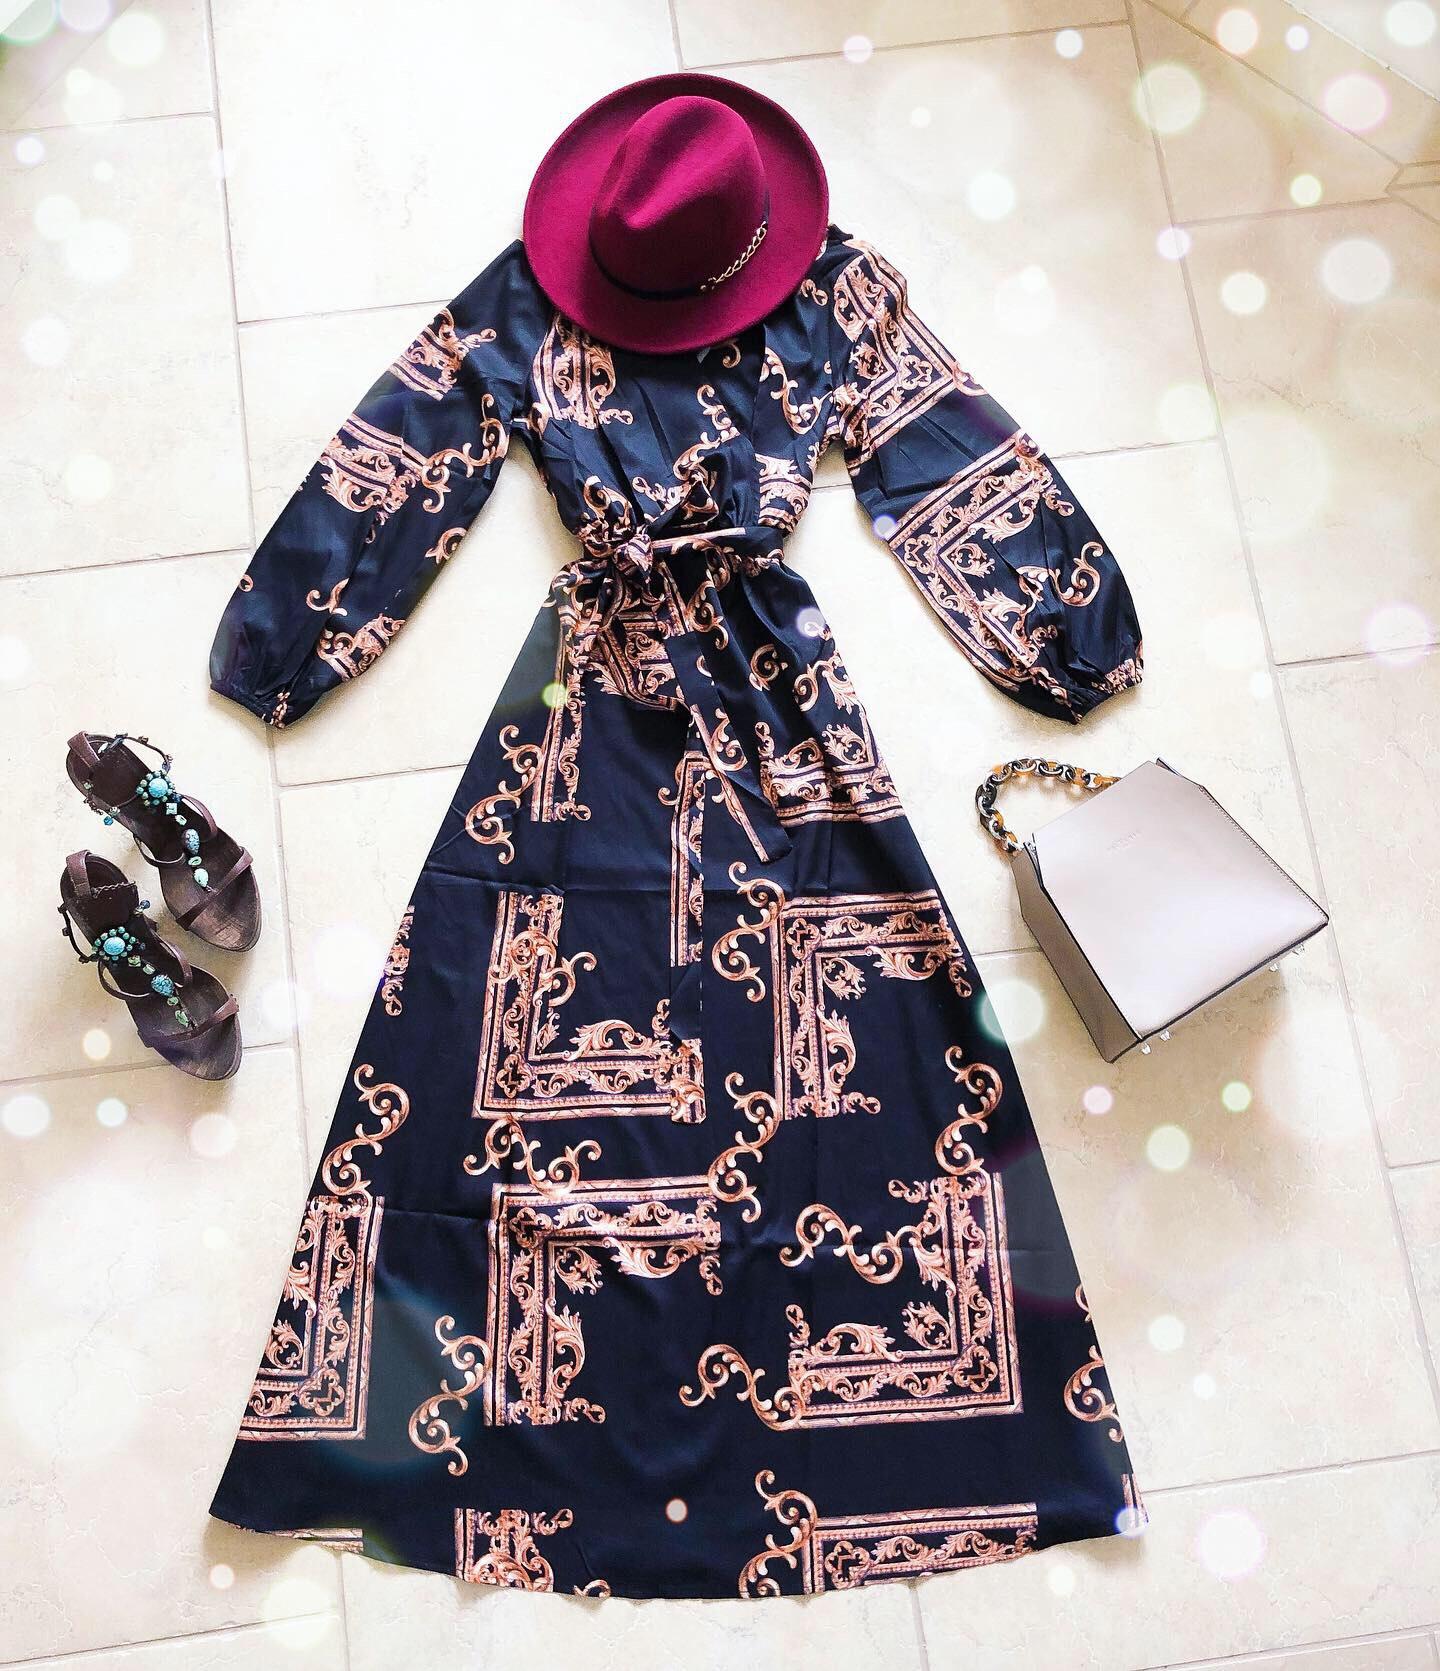 Dress: SHEIN 637243  http://bit.ly/2PZryFv , Shoes: Giuseppezanotti, Purse: Frederic T Paris, Hat: SoPeacock